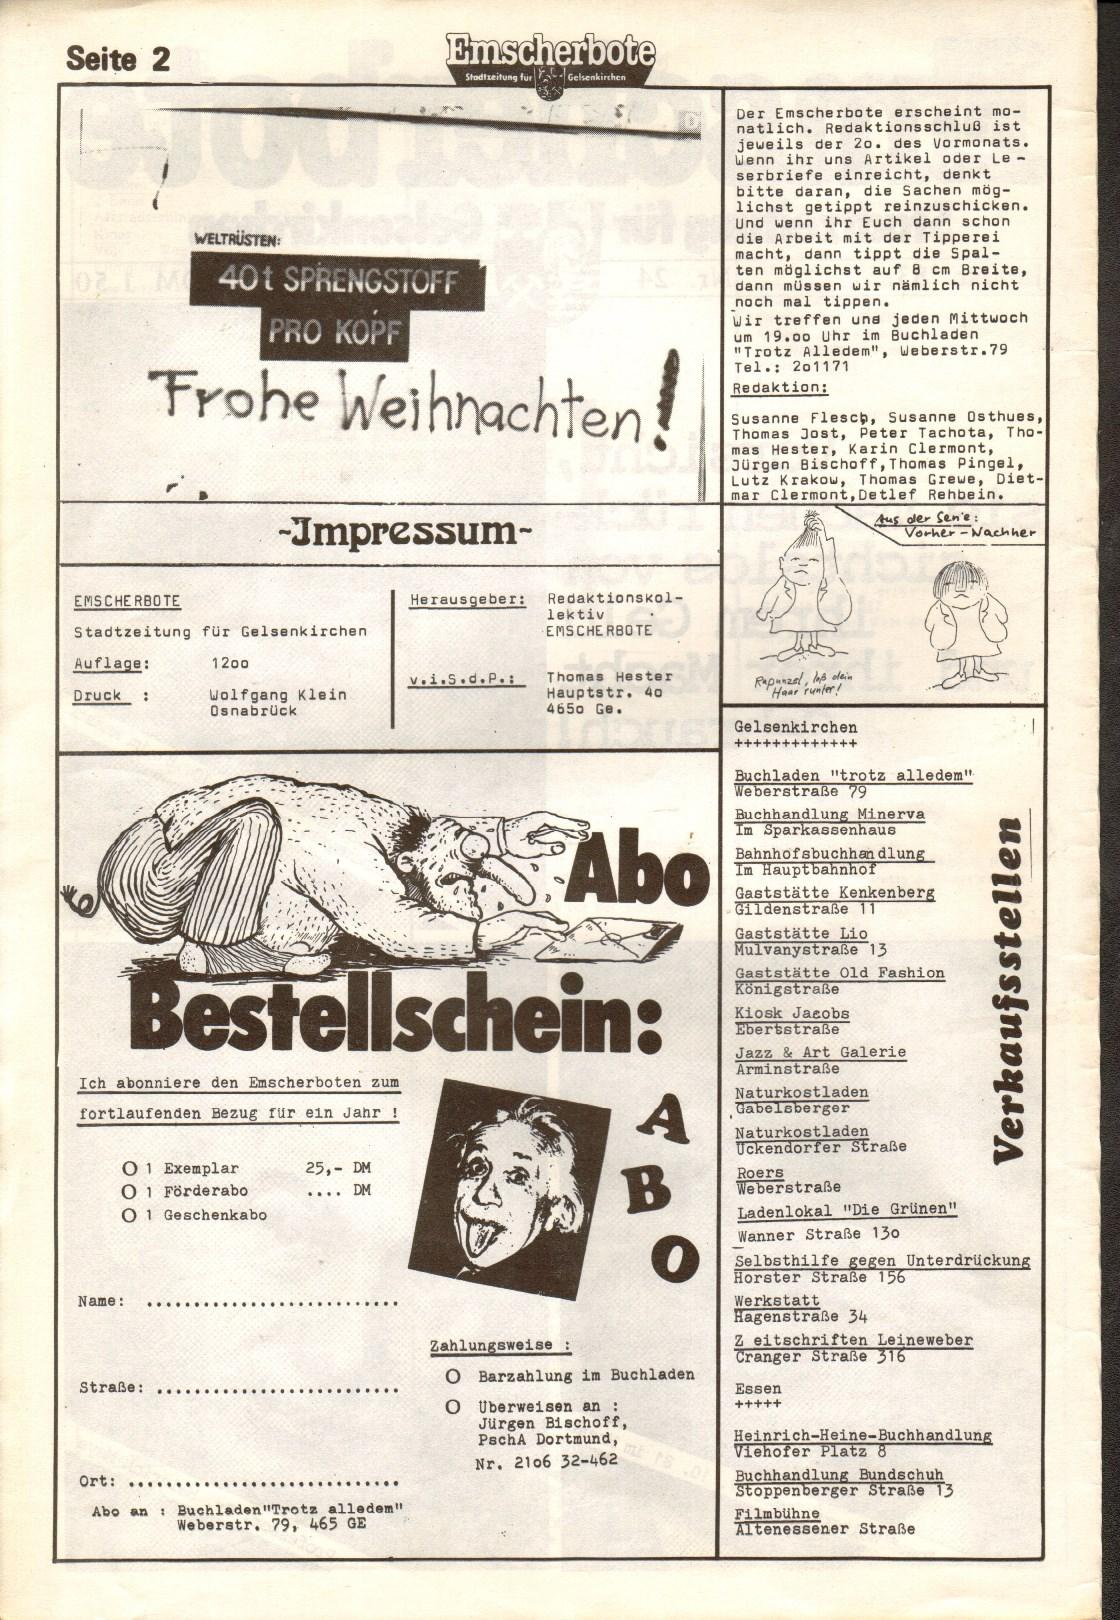 Gelsenkirchen_Emscherbote_1983_24_02